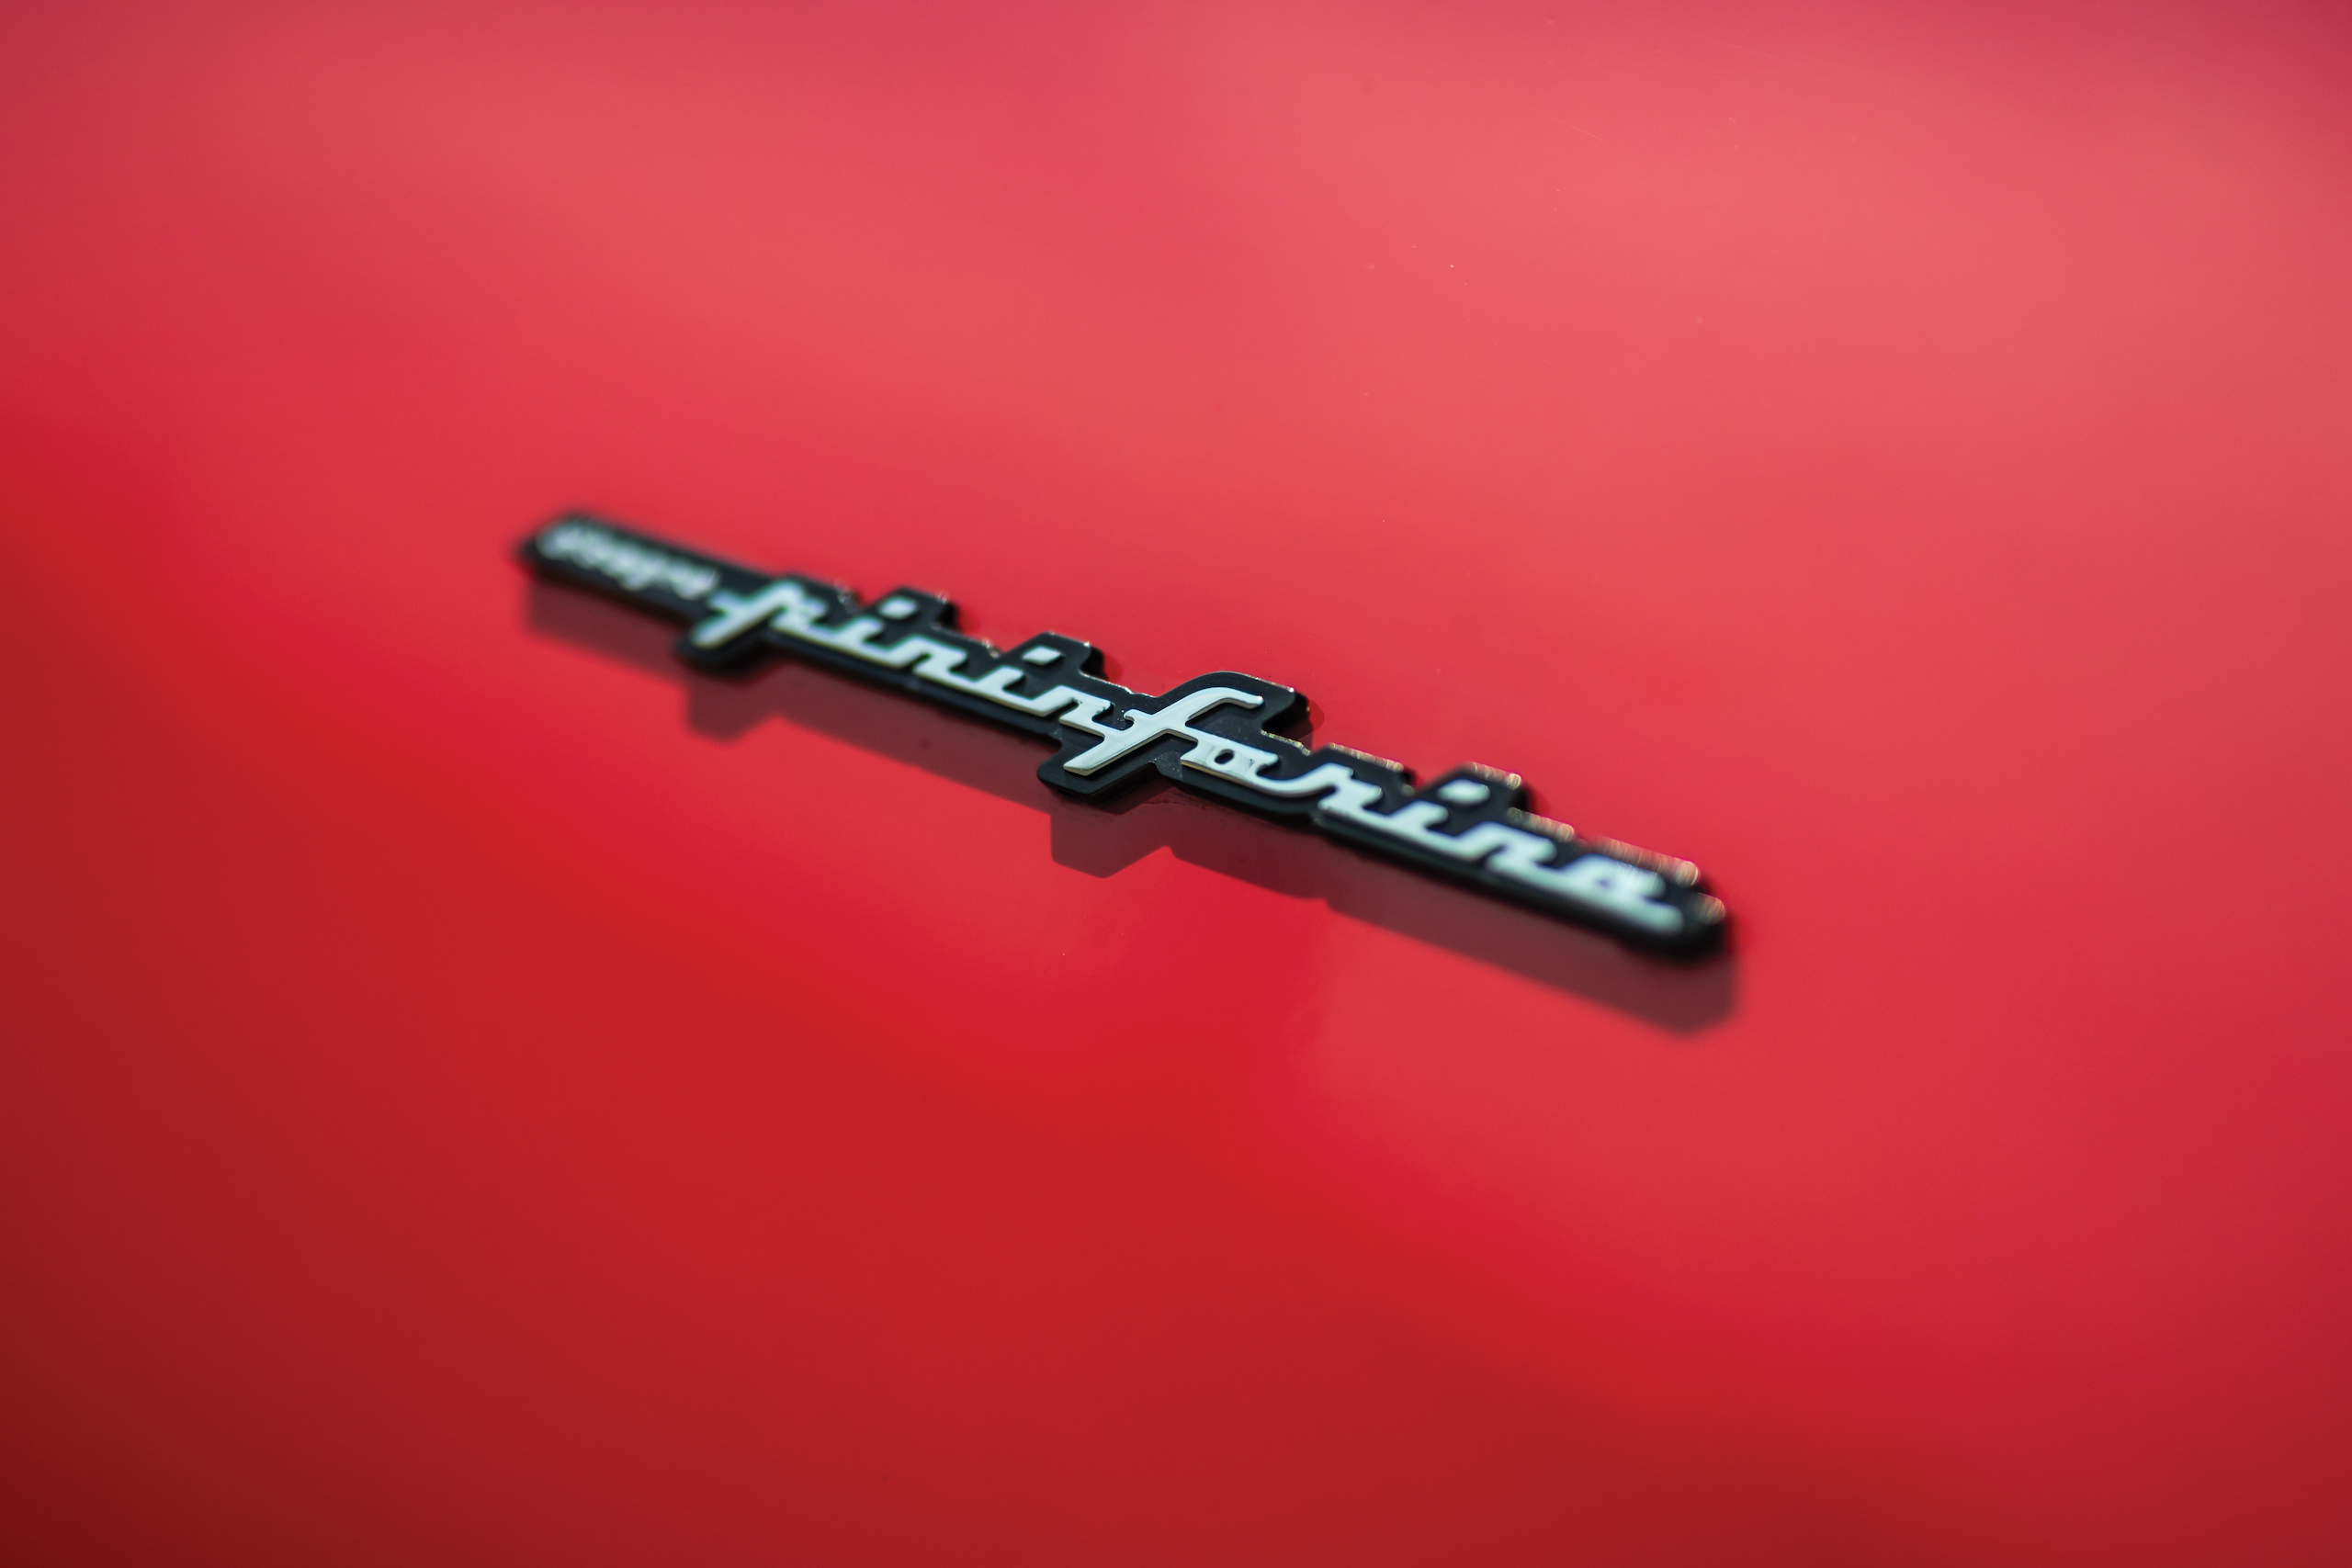 2003 Ferrari Enzo pininfarina badge detail